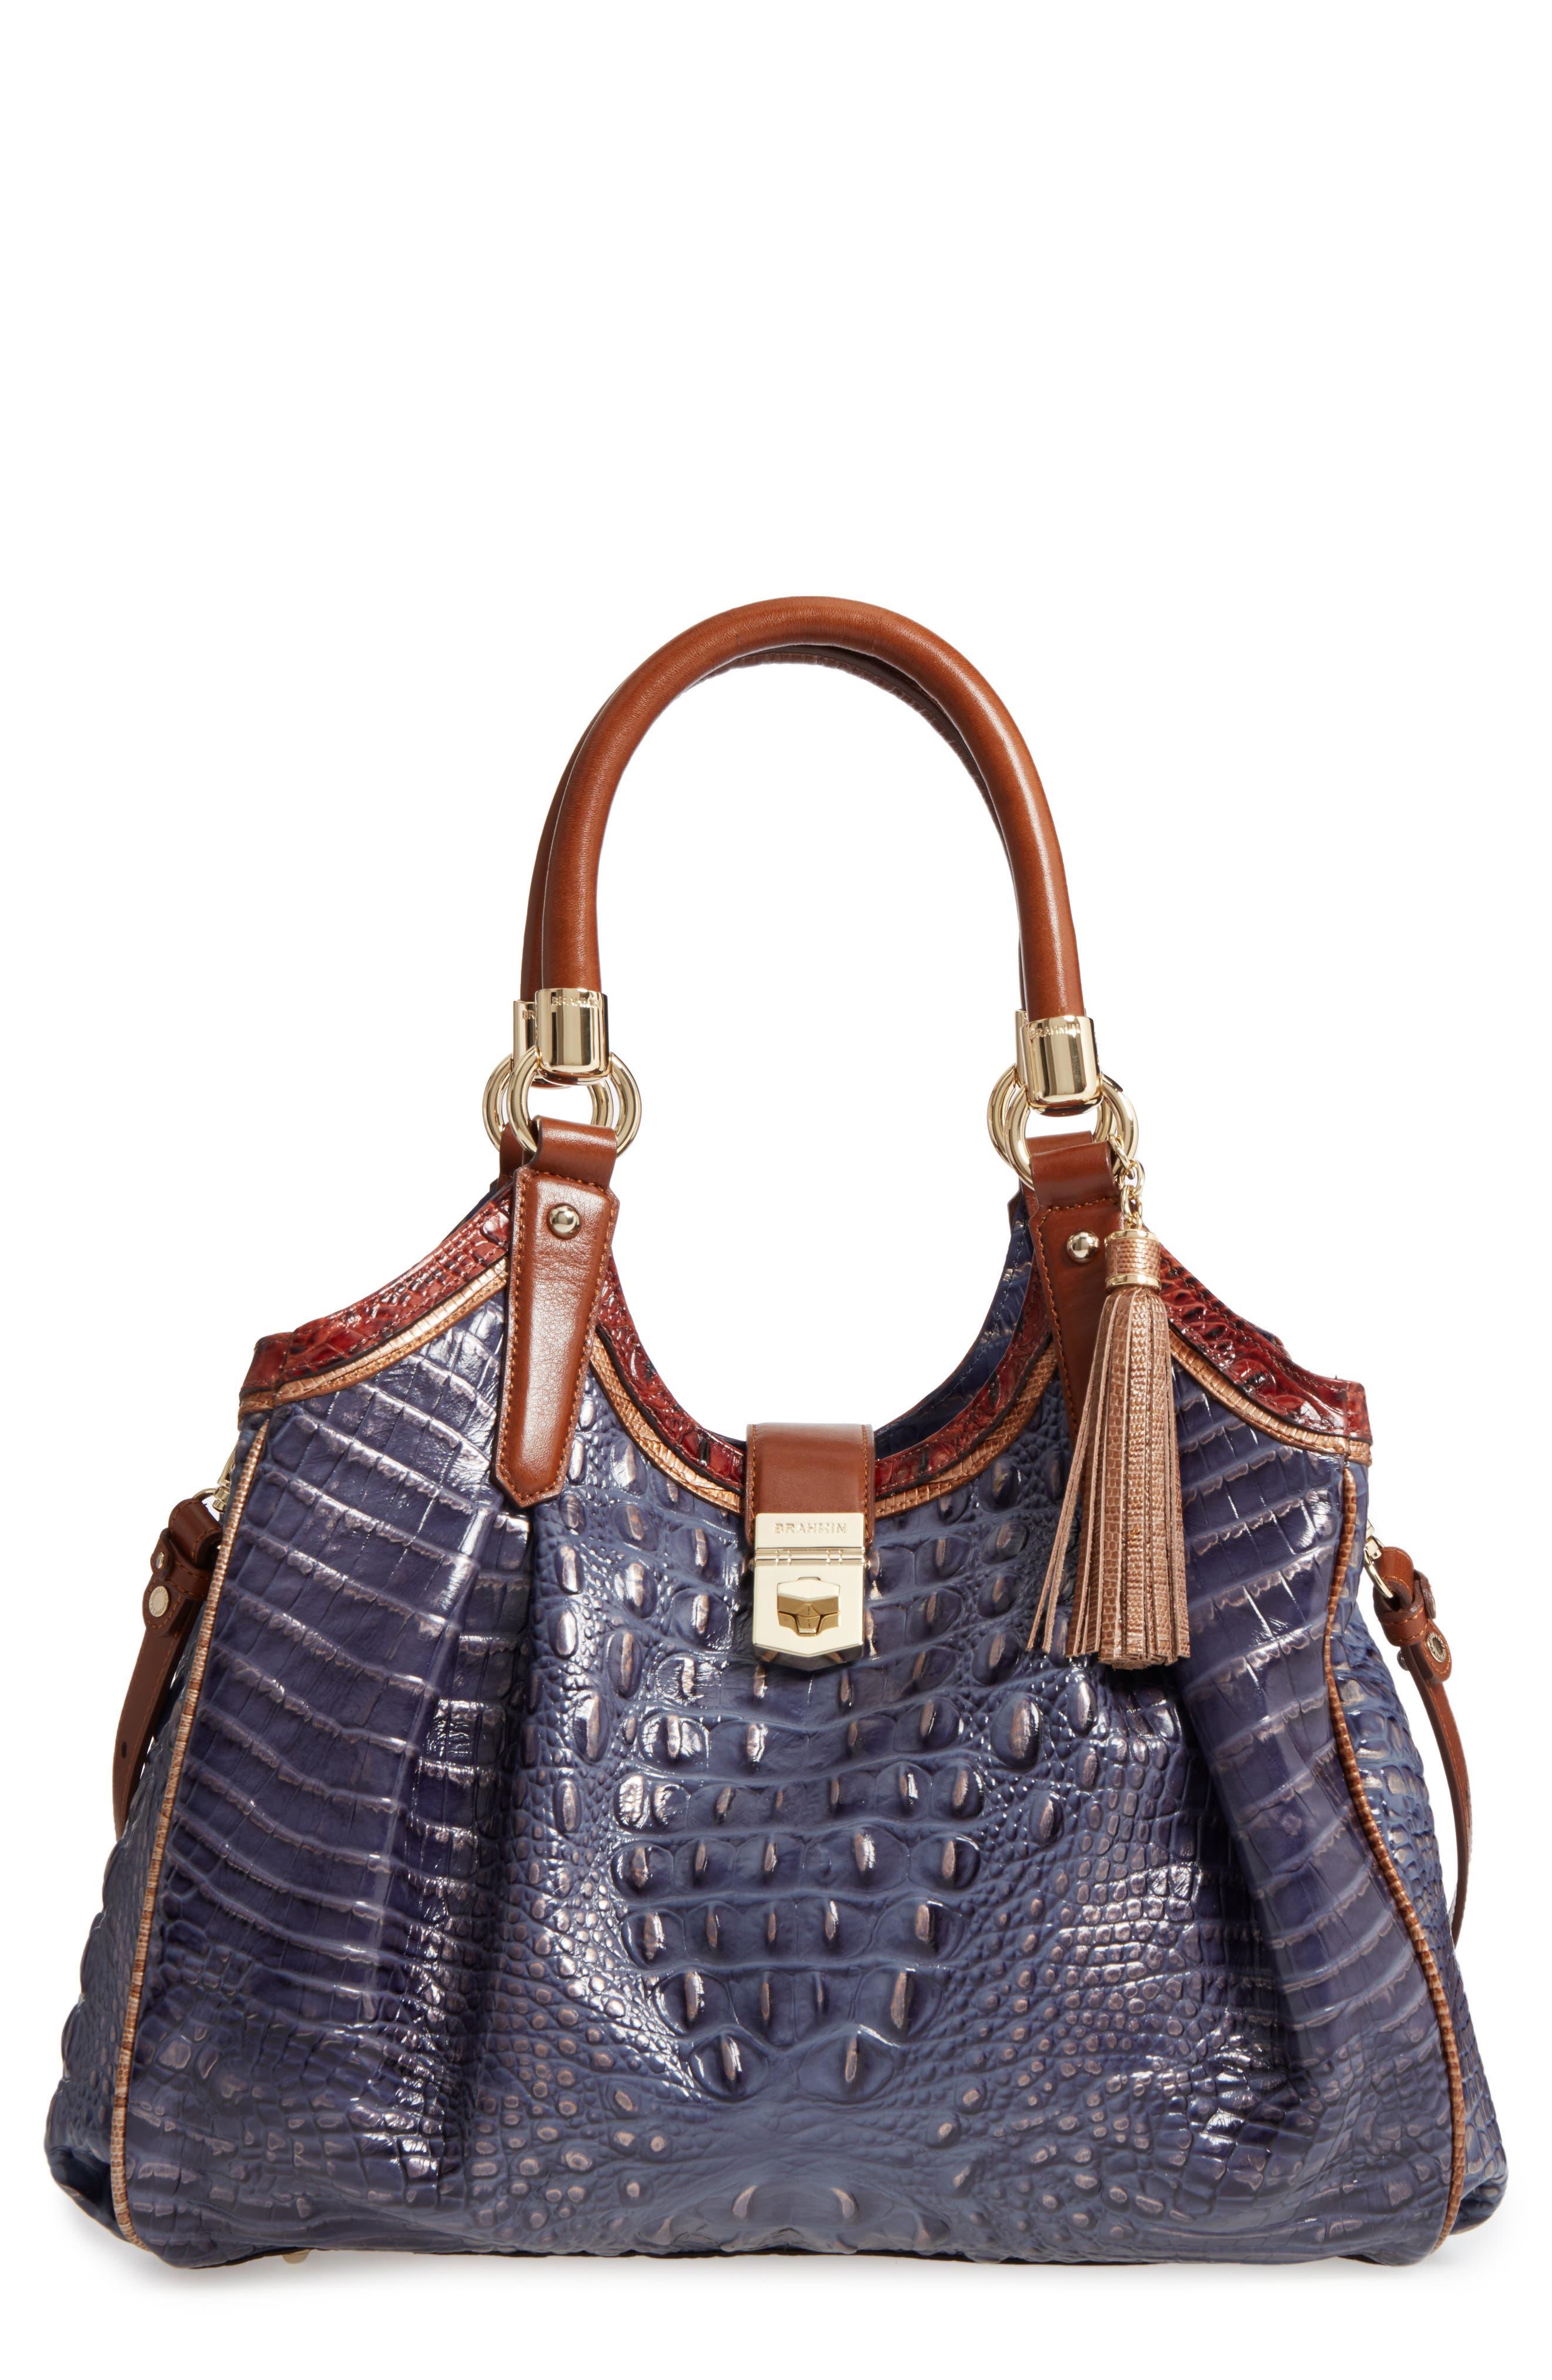 Brahmin Andesite Lucino Elisa Leather Shoulder Bag